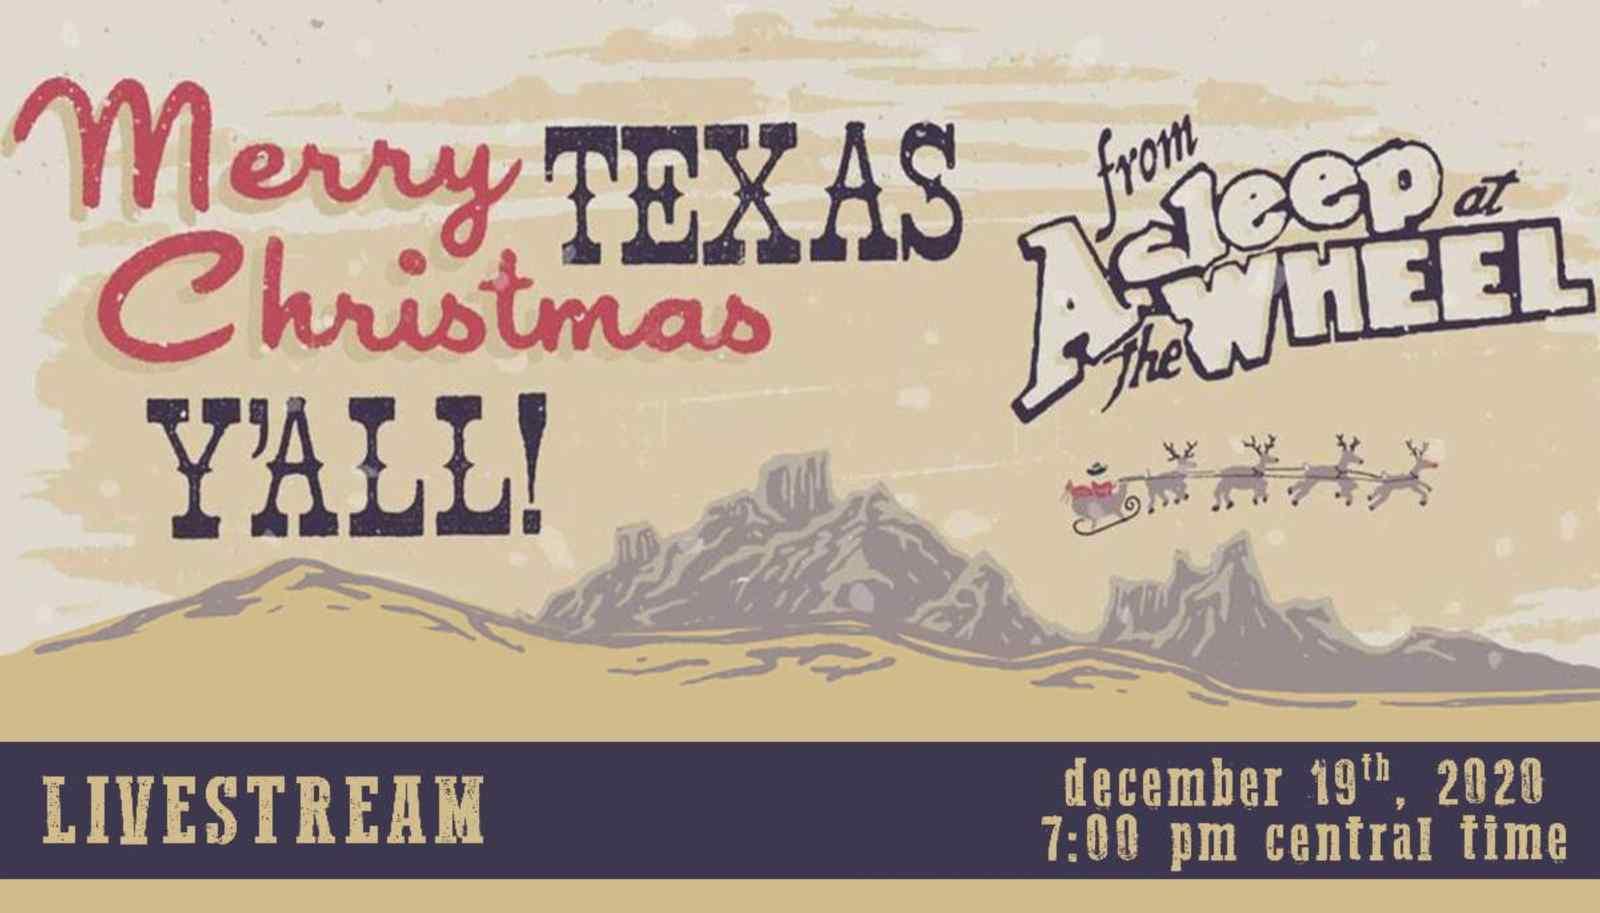 Merry Texas Christmas, Y'all!: Asleep At The Wheel